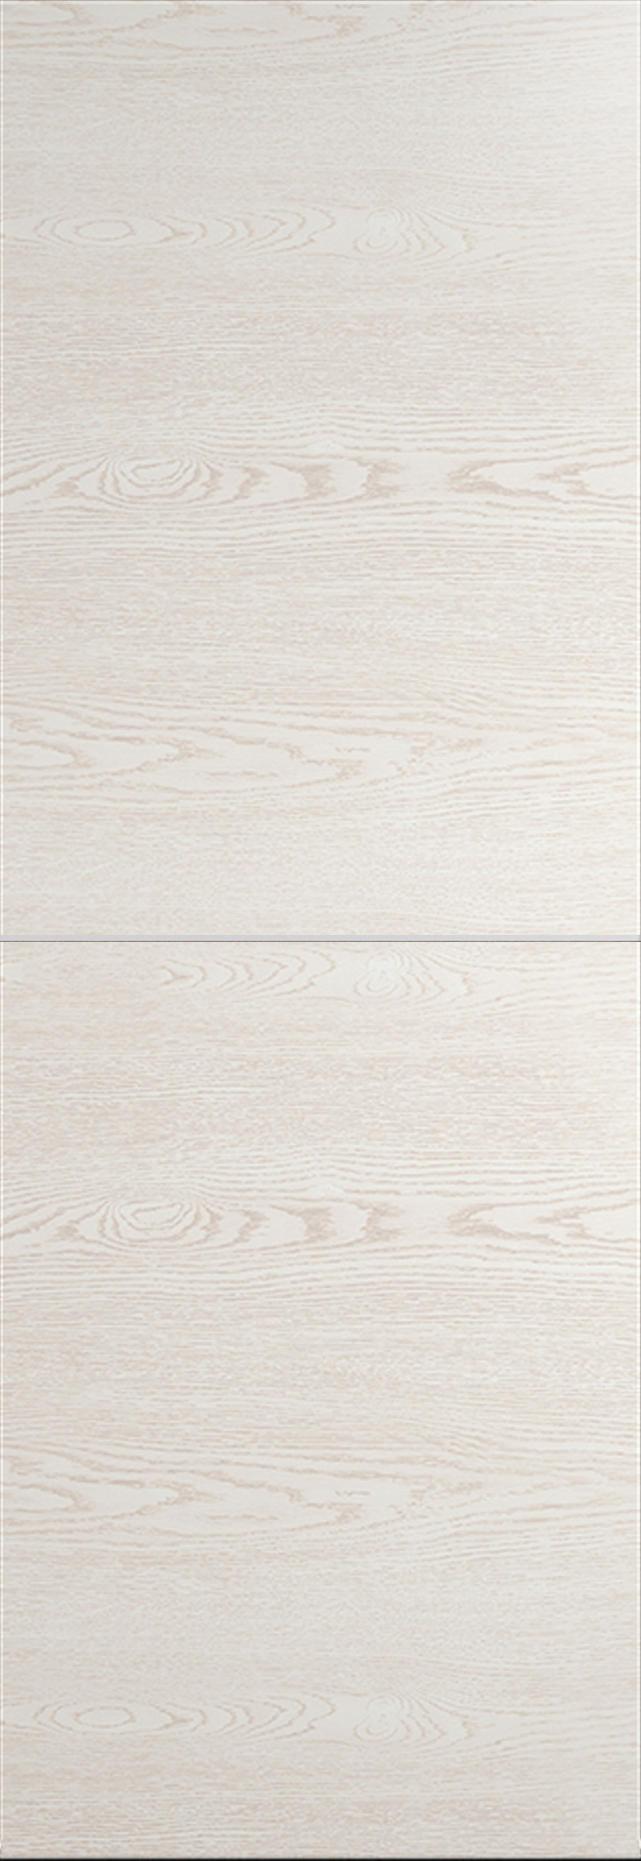 Tivoli Б-3 Invisible цвет - Белый ясень Без стекла (ДГ)